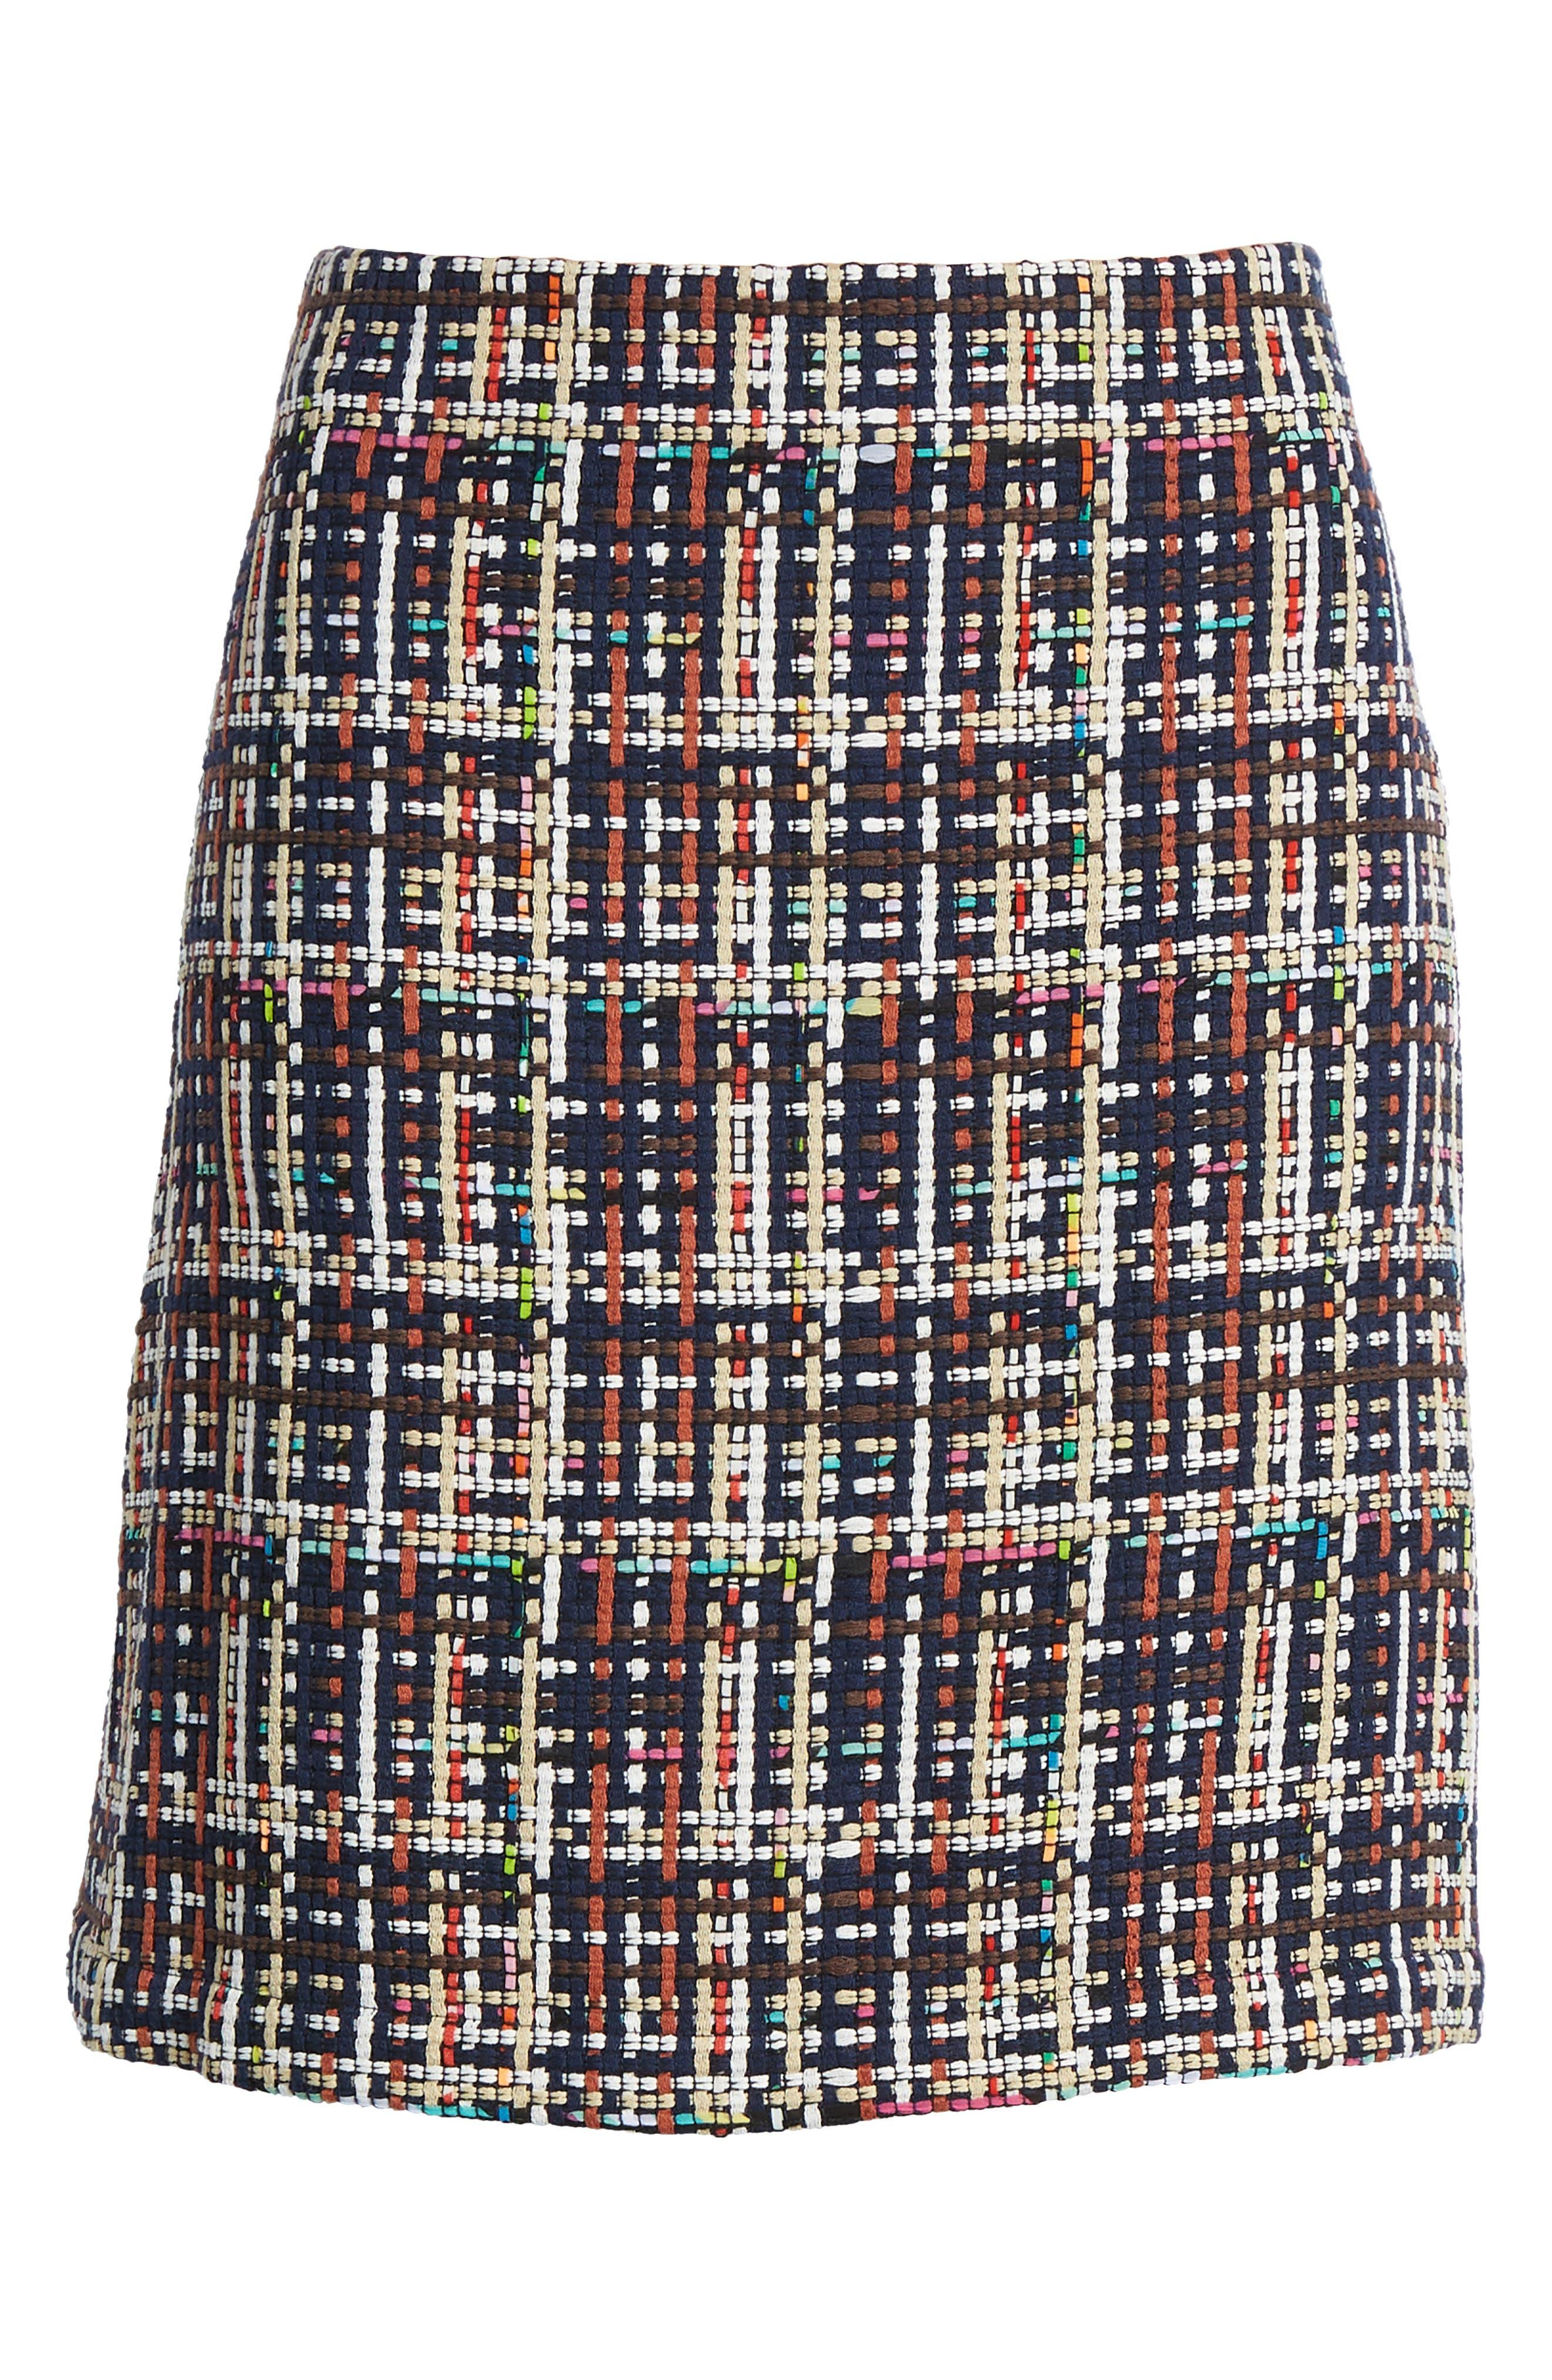 Tweed Mini Skirt,                             Alternate thumbnail 8, color,                             Navy Multi Tweed